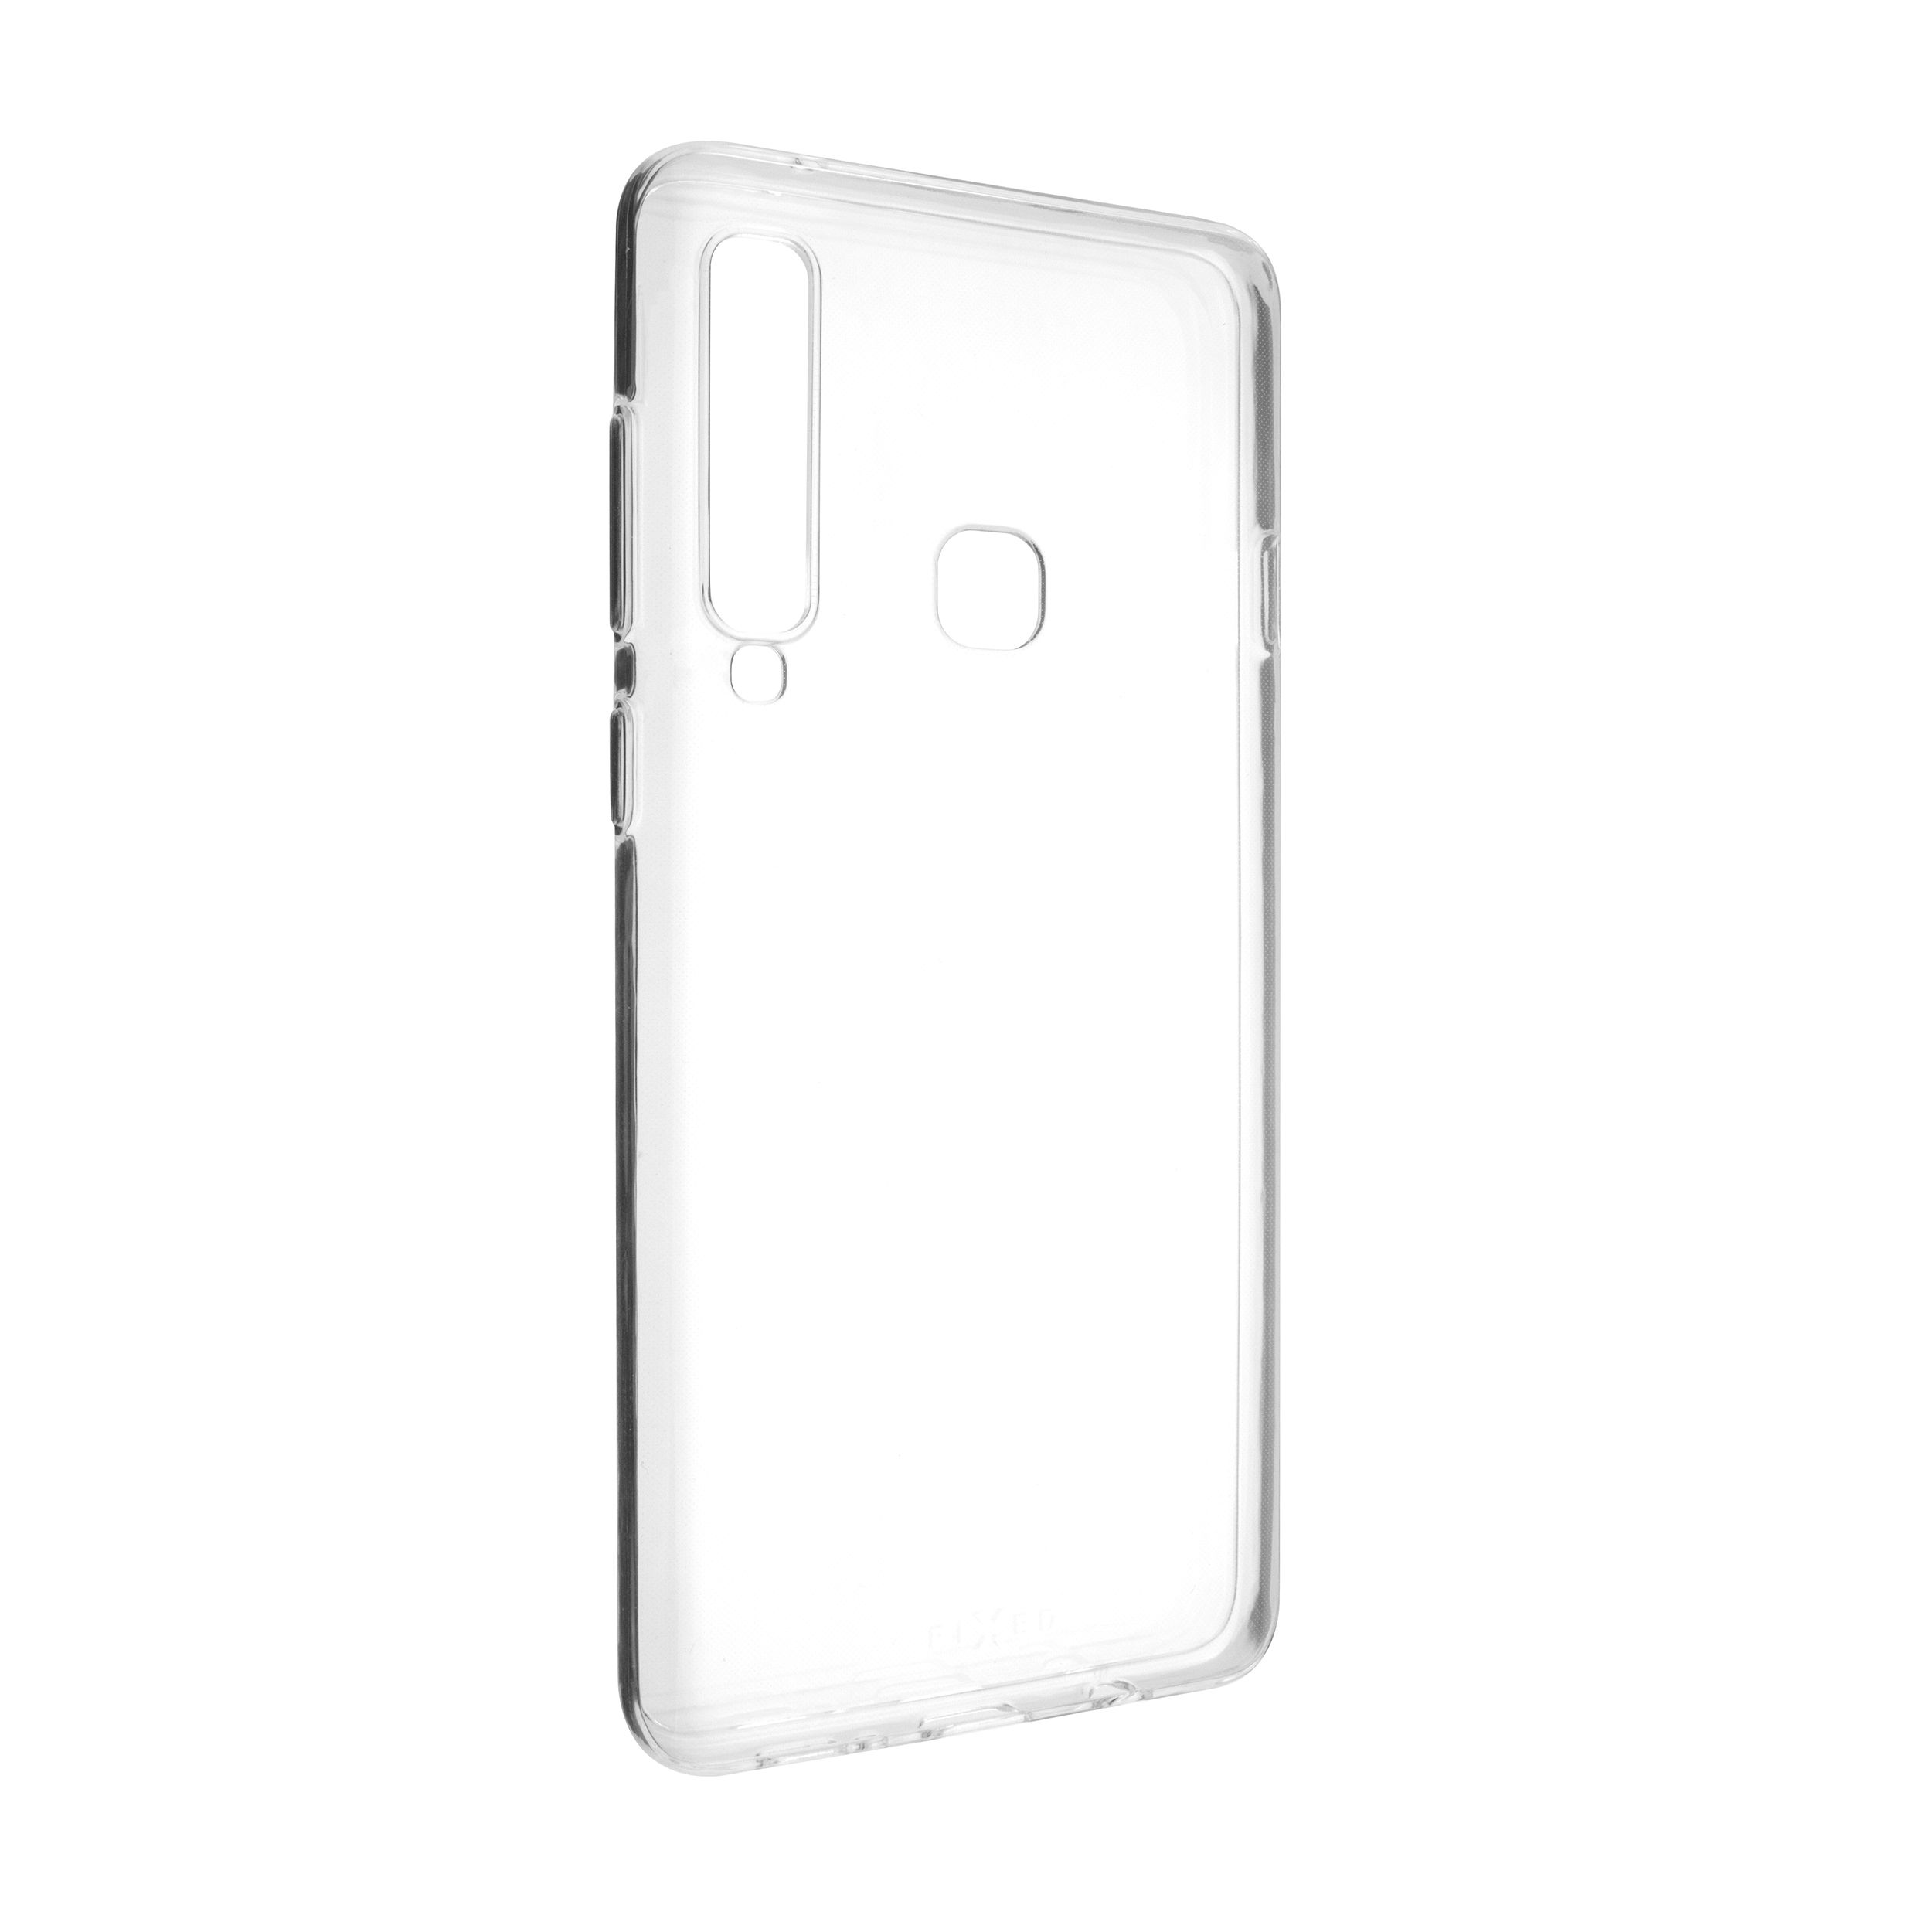 Ultratenké TPU gelové pouzdro FIXED Skin pro Samsung Galaxy A9 (2018), 0,6 mm, čiré